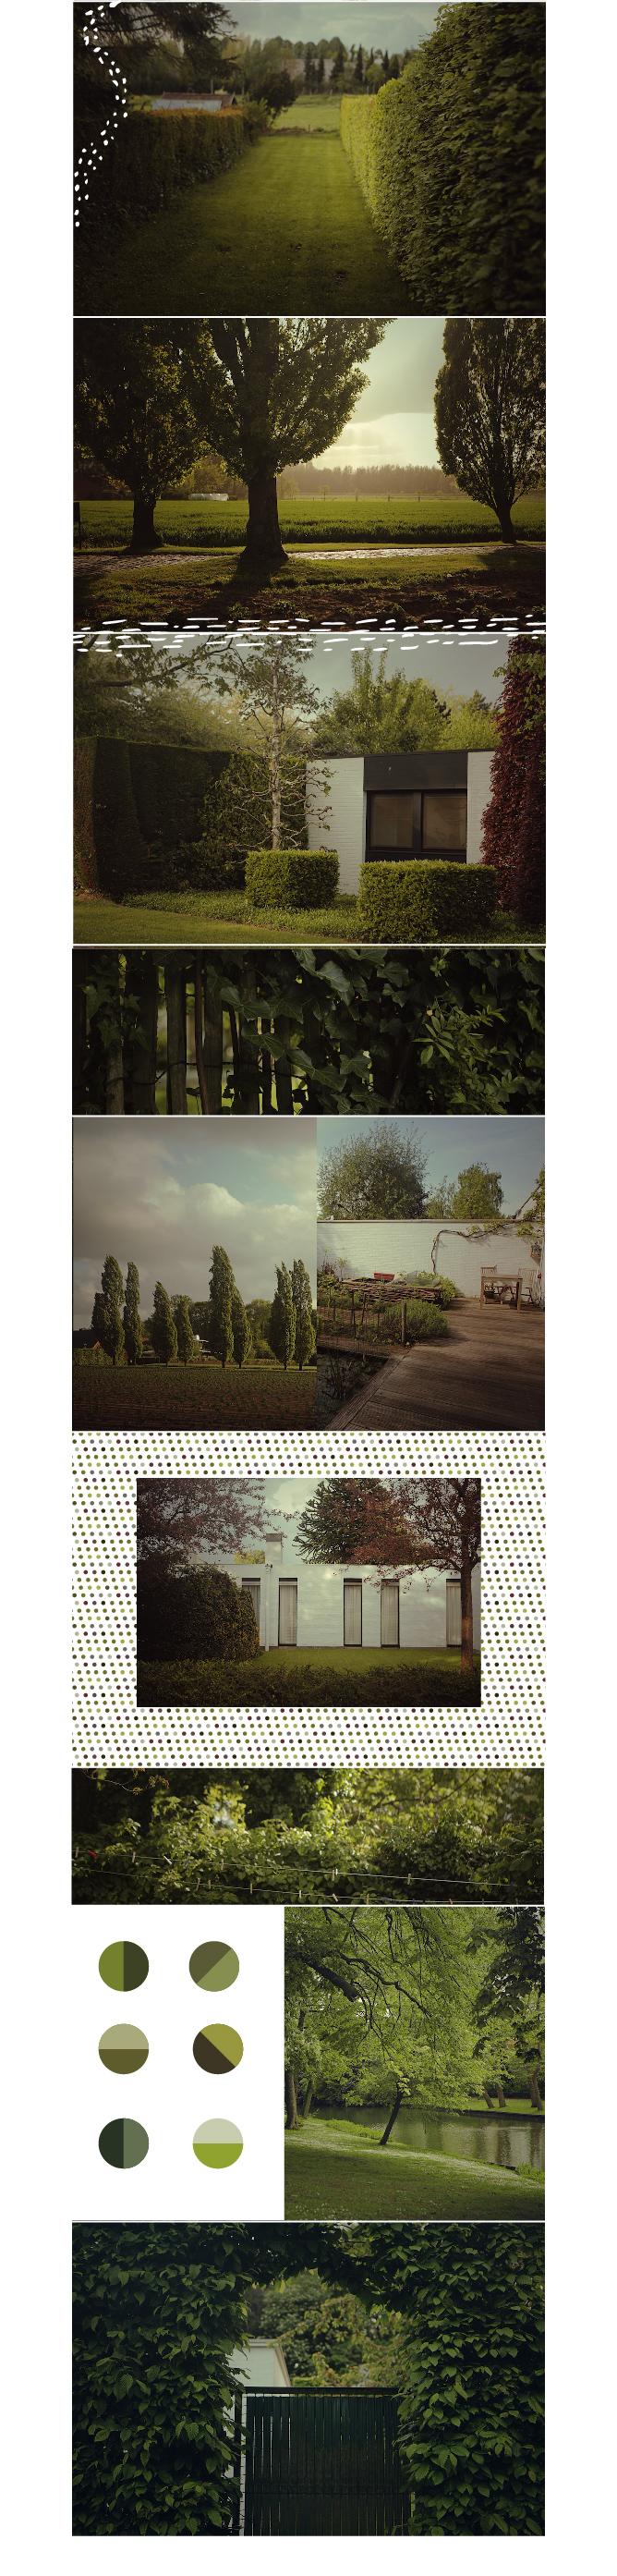 Belgium_Layout-4-01.jpg